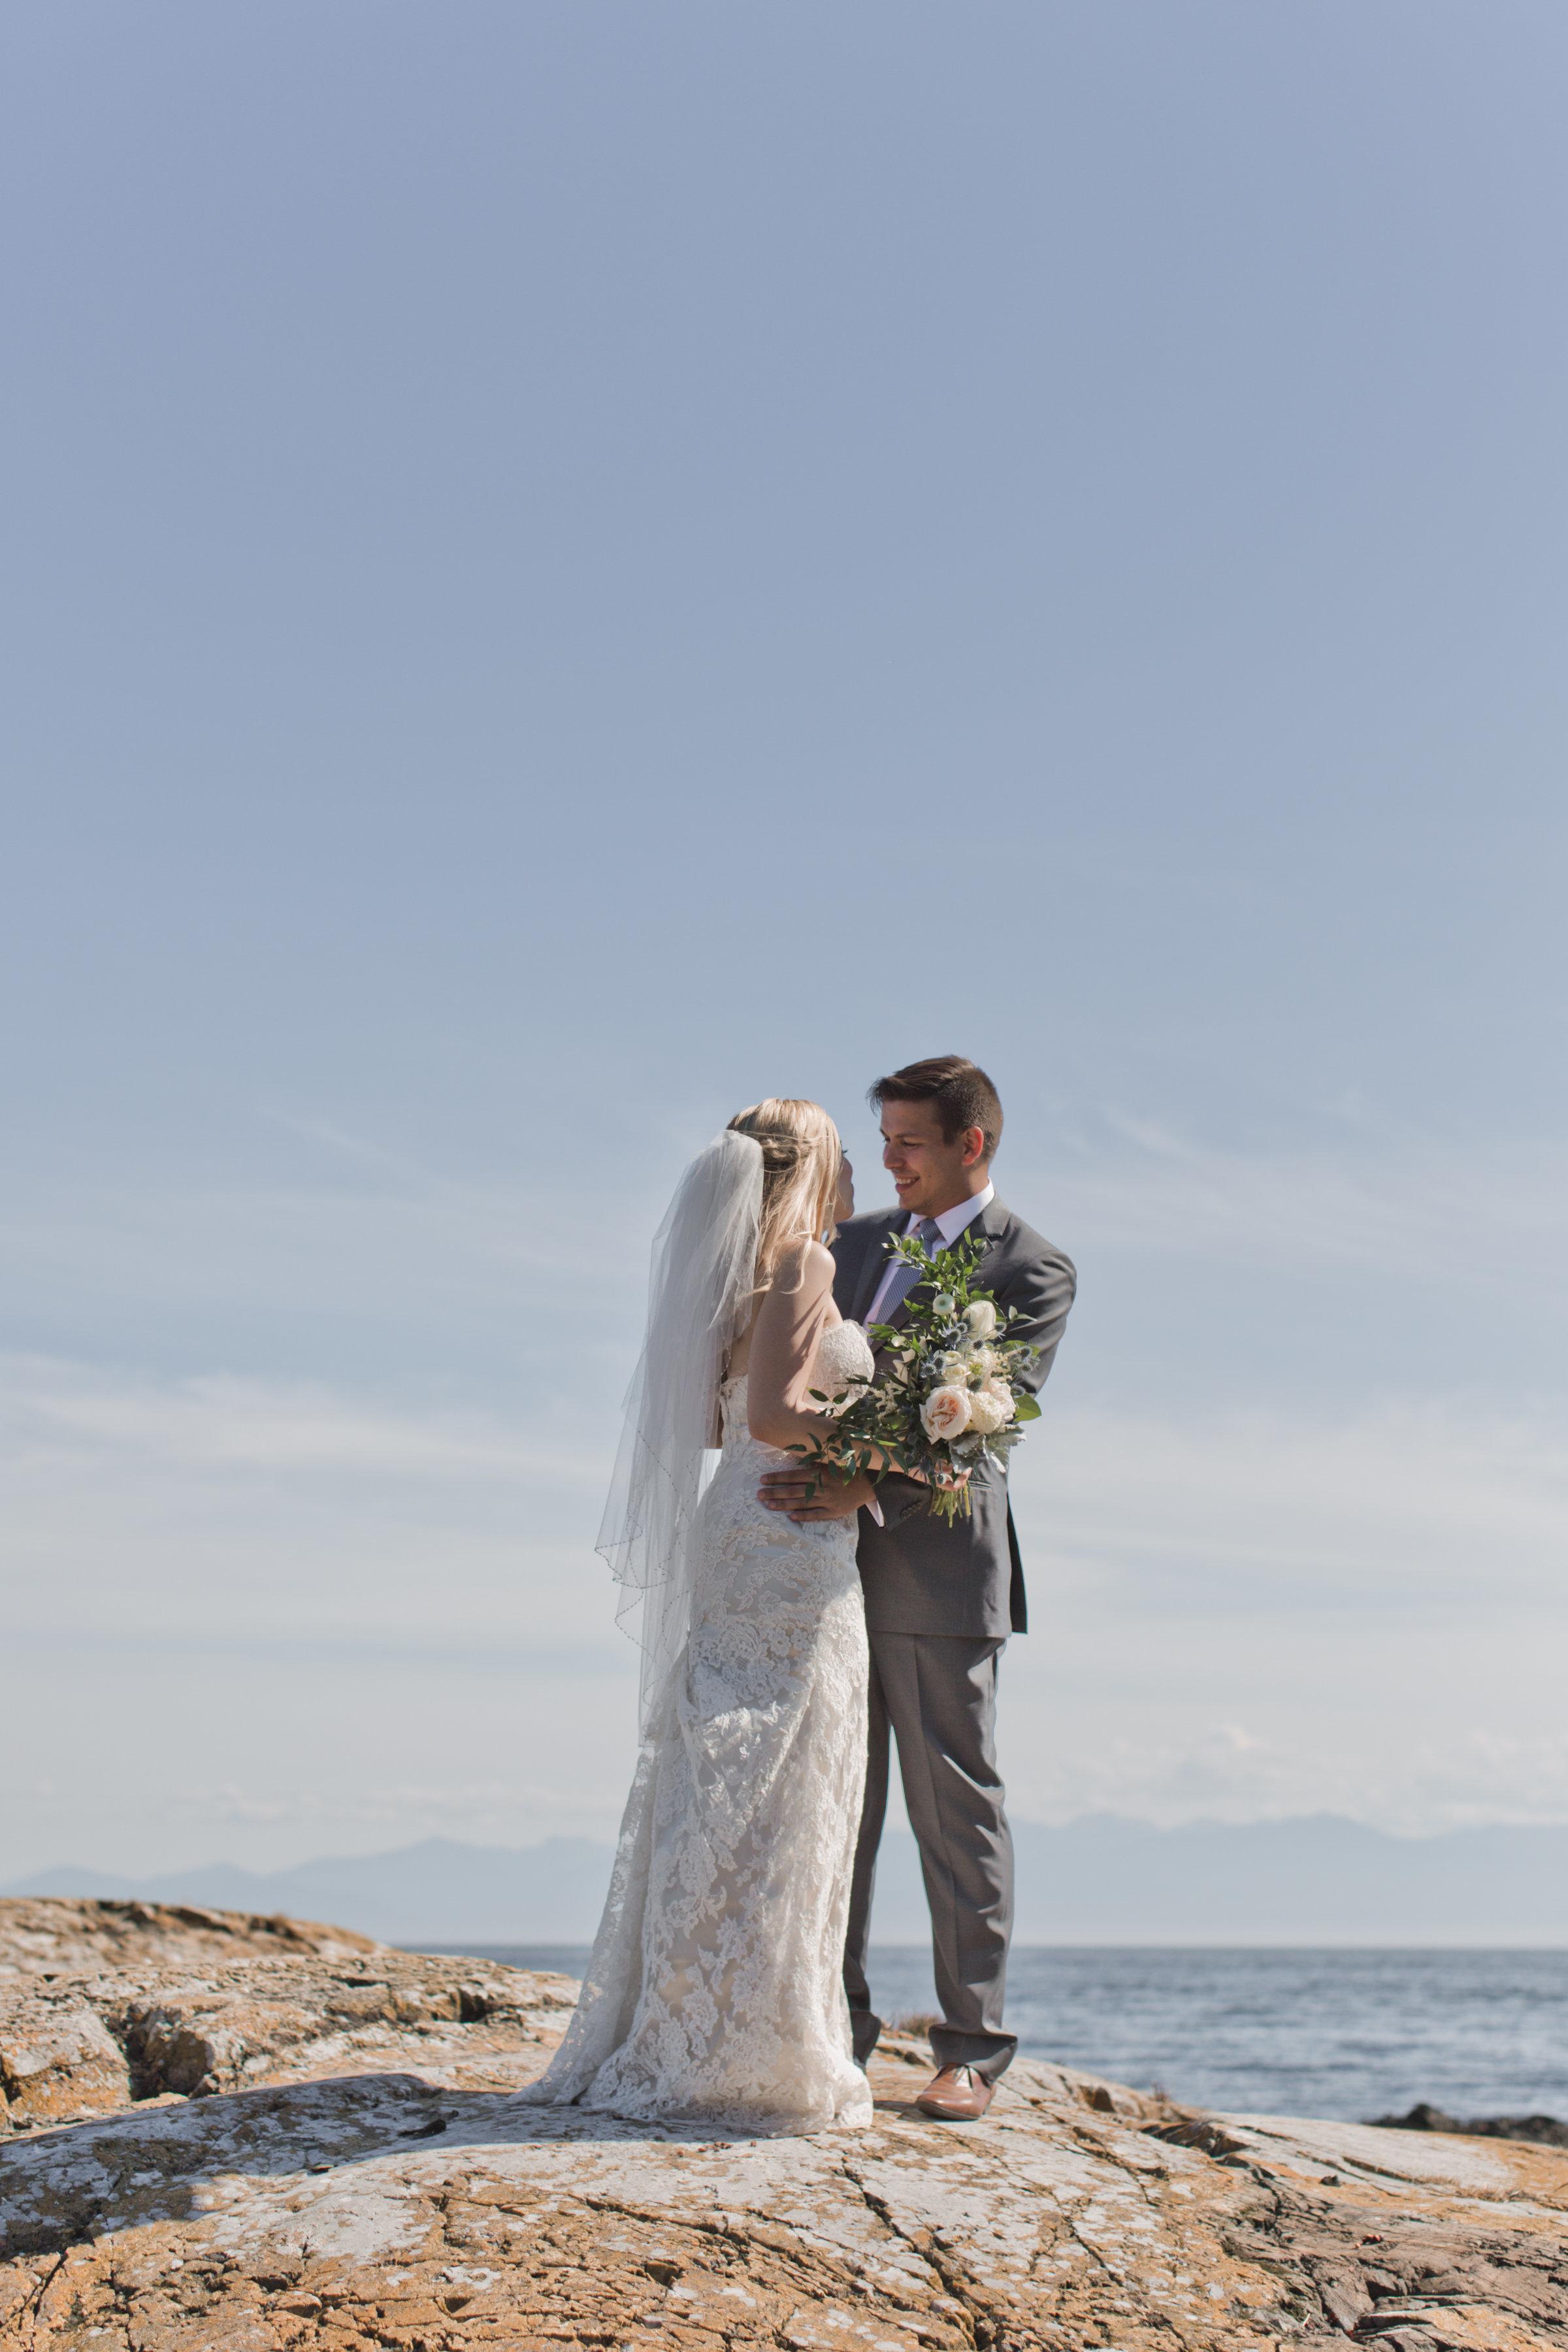 View More: http://meghanhemstra.pass.us/annieandvladmarried